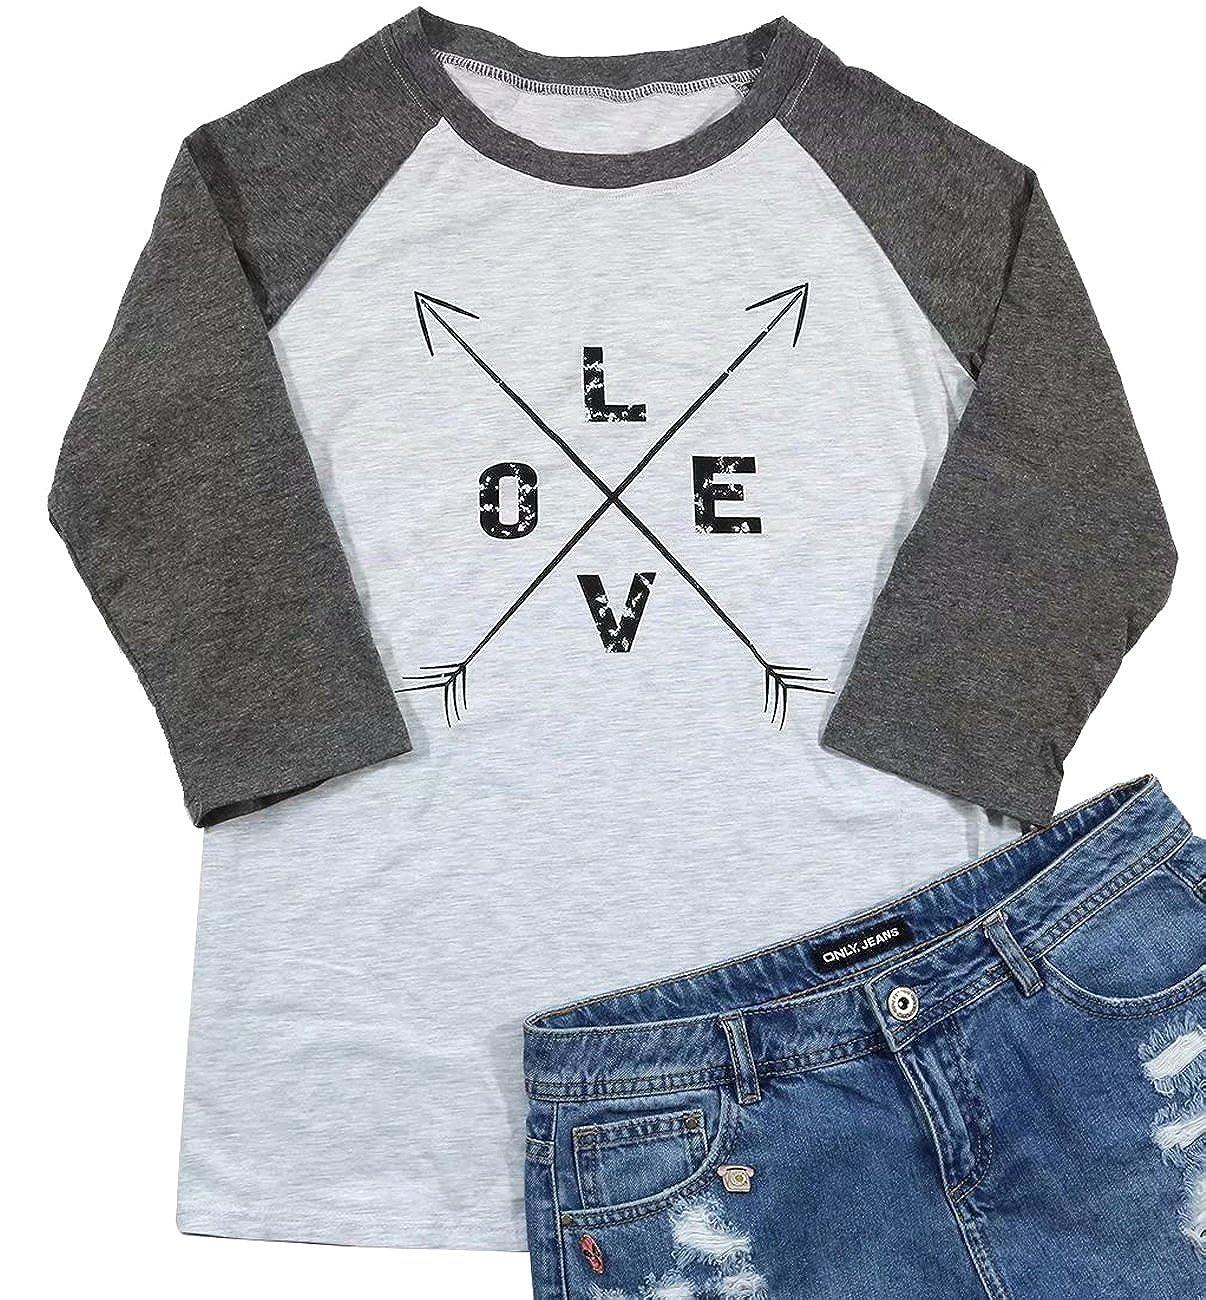 Amazon Love Crossed Arrows Cute Graphic T Shirt Women 34